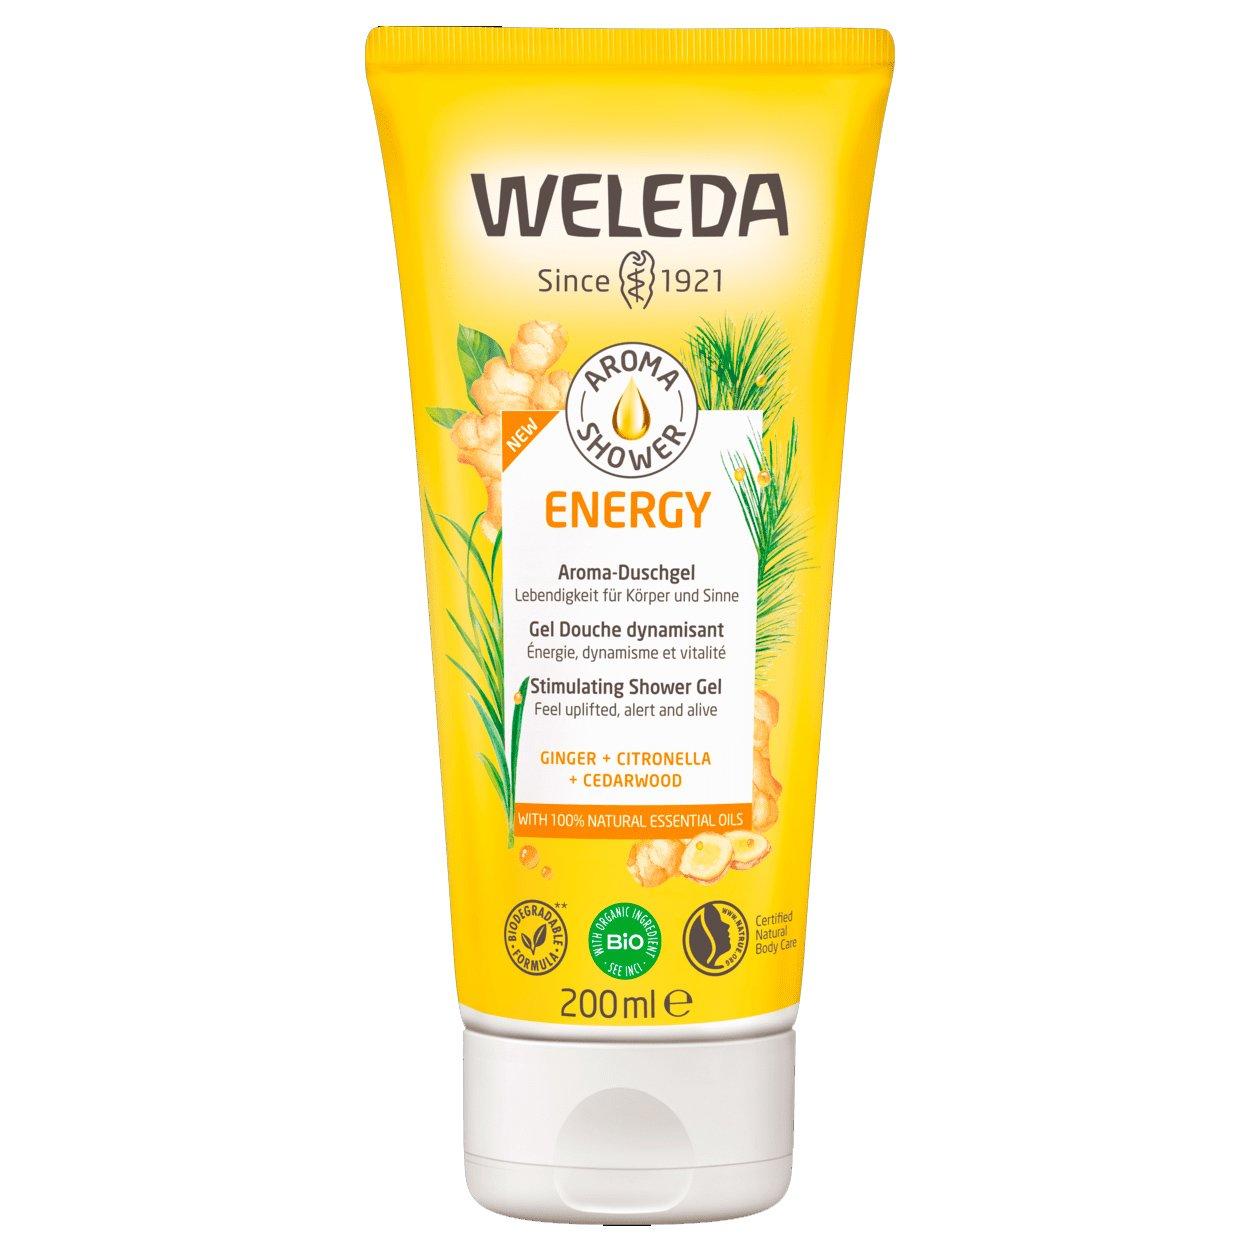 Weleda Energy Aroma Shower Gel Κρεμοντούς με Πιπερόριζα & Σιτρονέλα 200ml